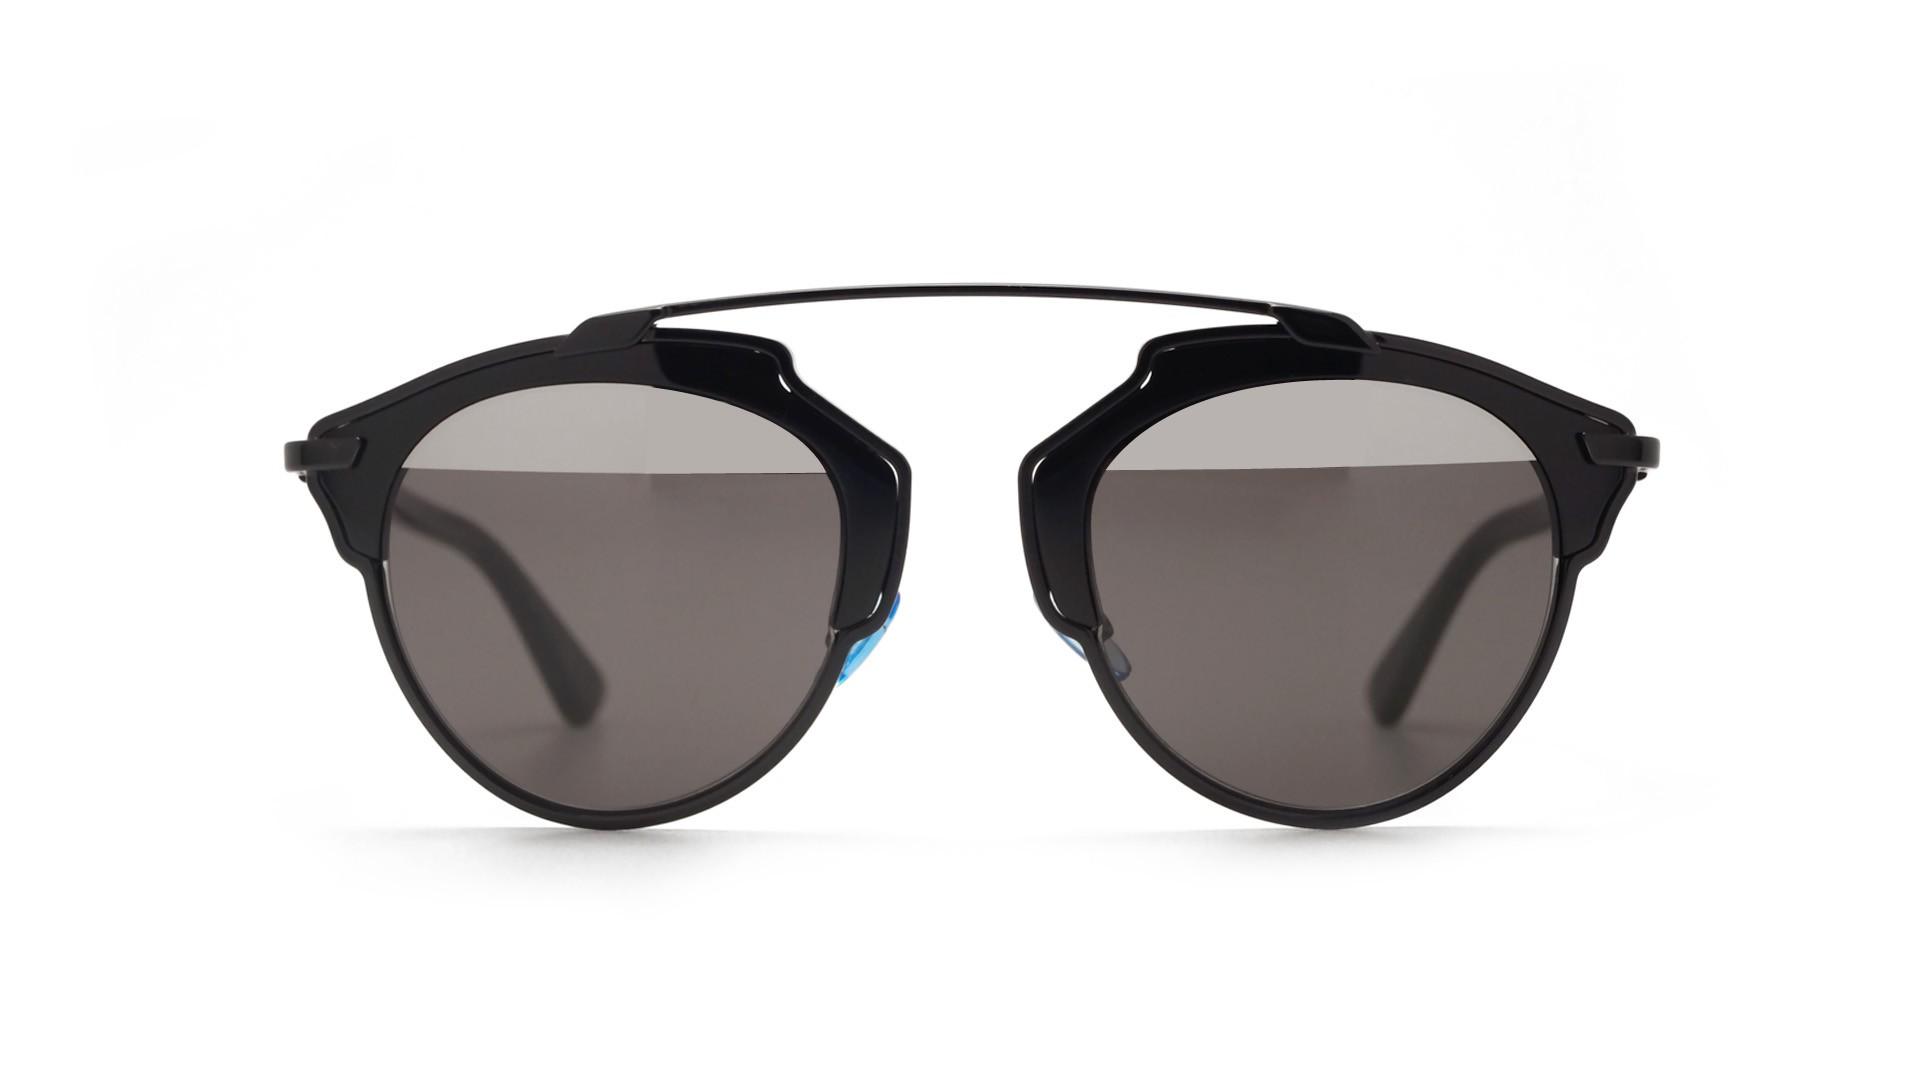 4bf34bff1457 Sunglasses Dior Soreal Black B0YMD 48-22 Medium